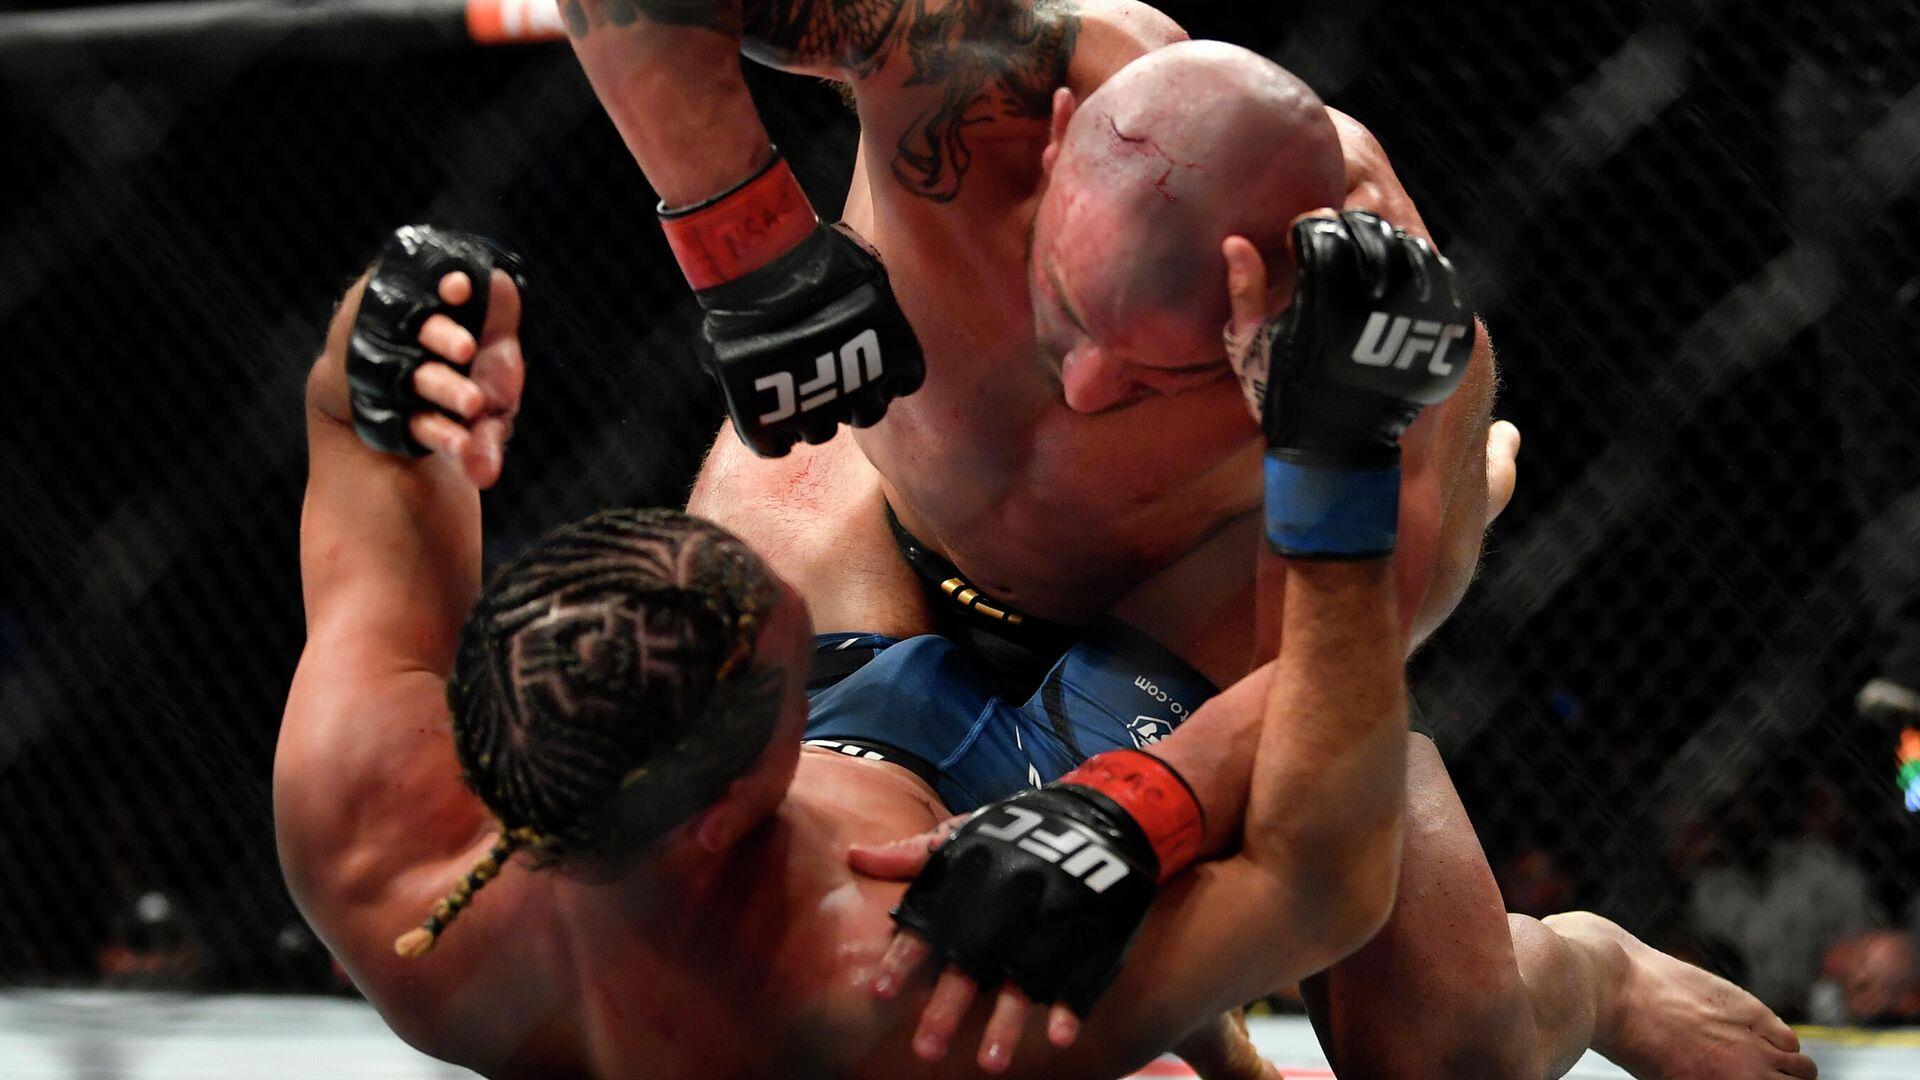 Волкановски против Ортеги на UFC 266 - РИА Новости, 1920, 26.09.2021